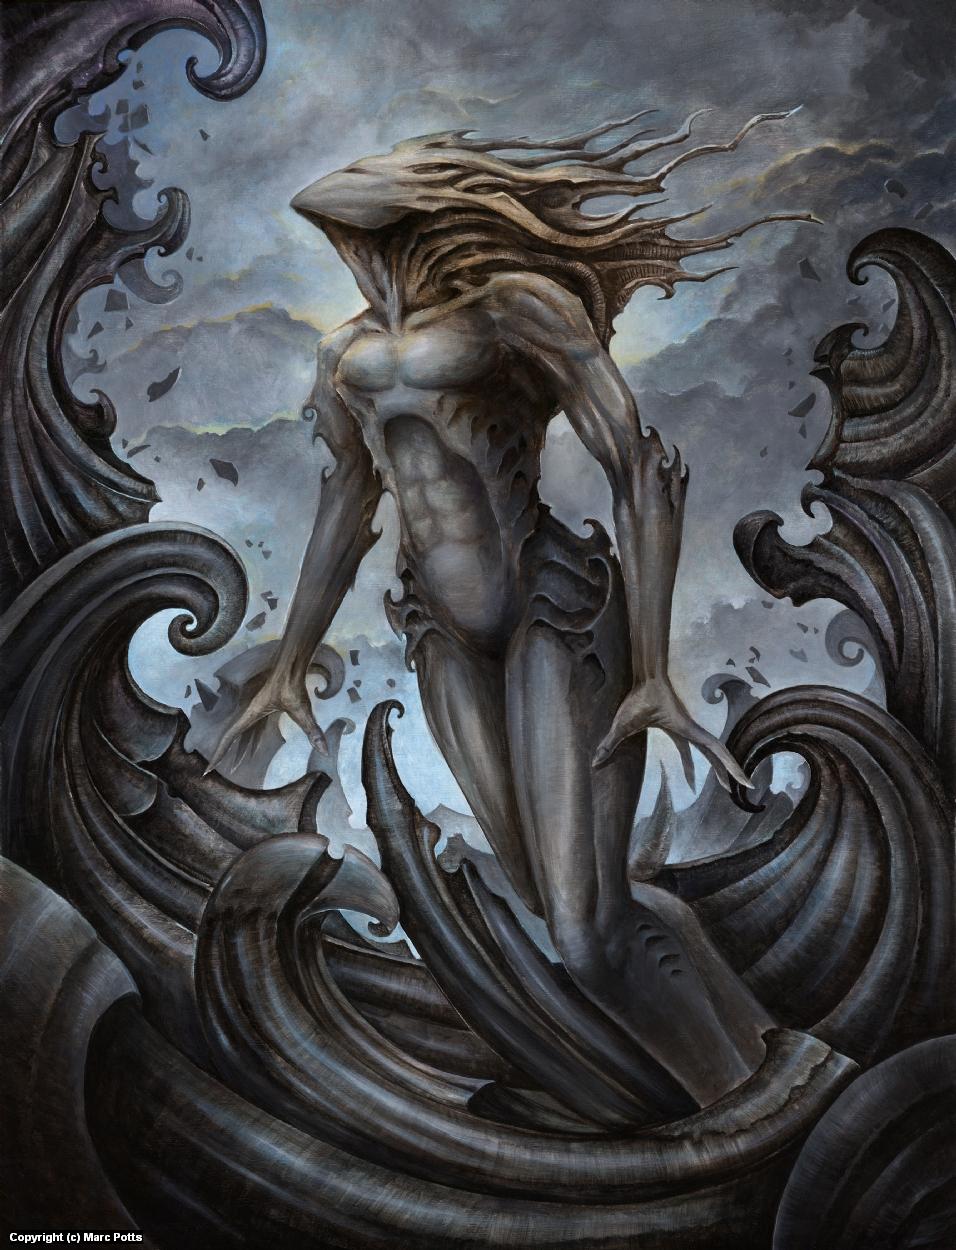 Dagon Artwork by Marc Potts